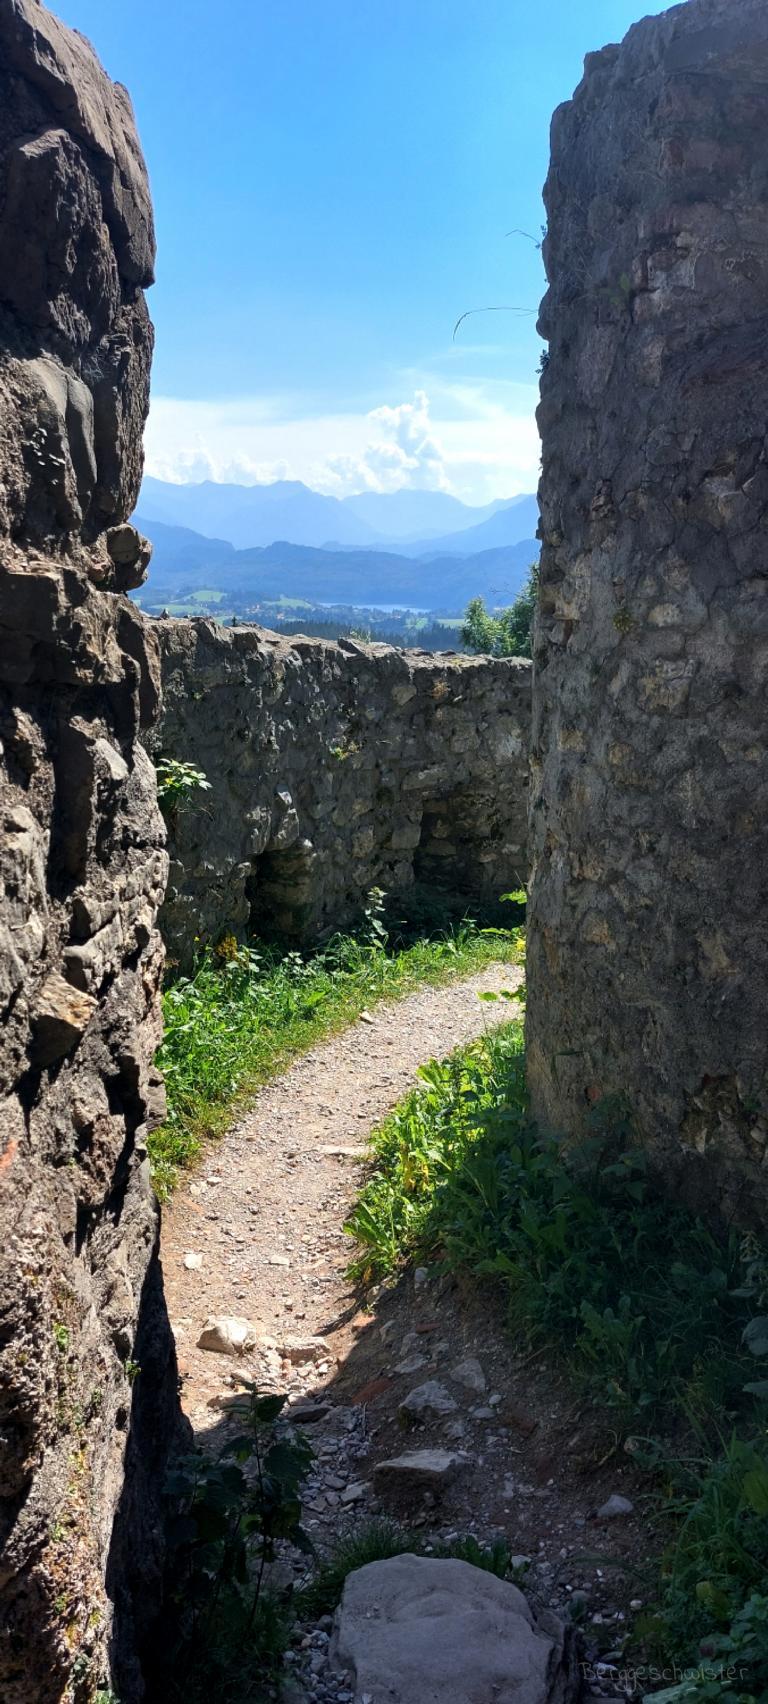 Burgruine Eisenberg Wandern mit Kindern im Allgäu Zwinger Ausblick